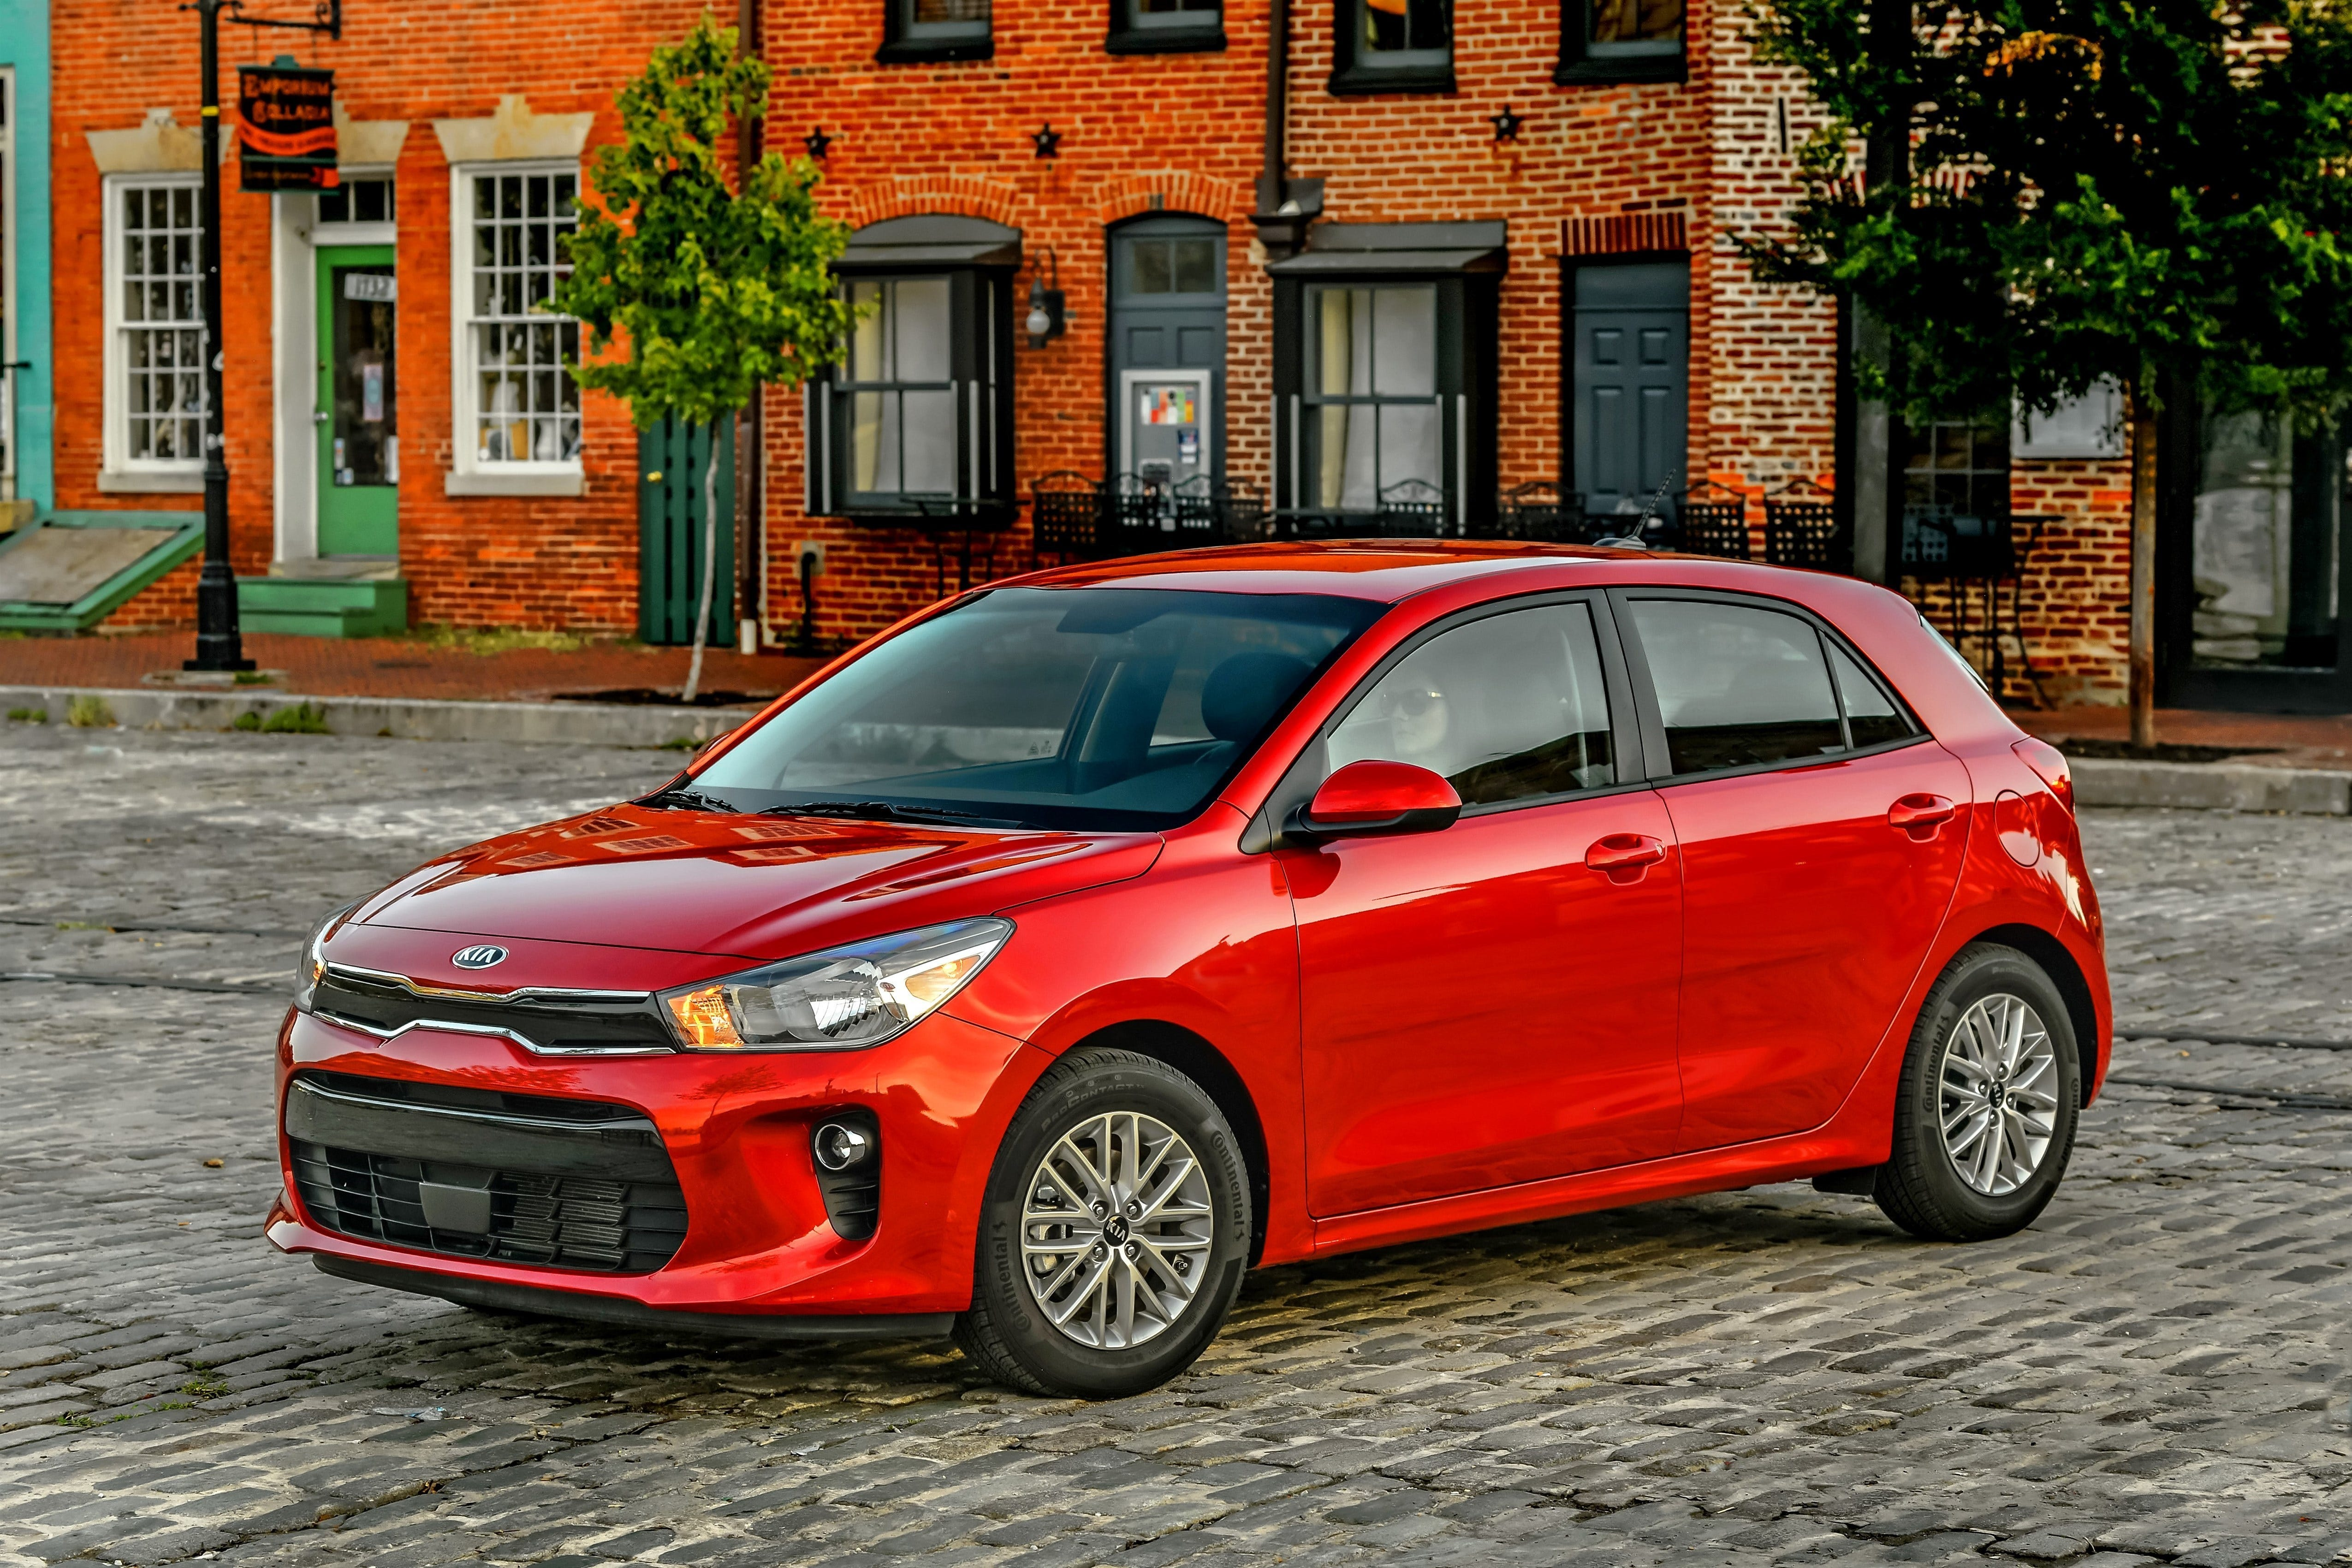 best-budget-friendly-small-cars-include-kia-honda-hyundai-and-mazda-sedans